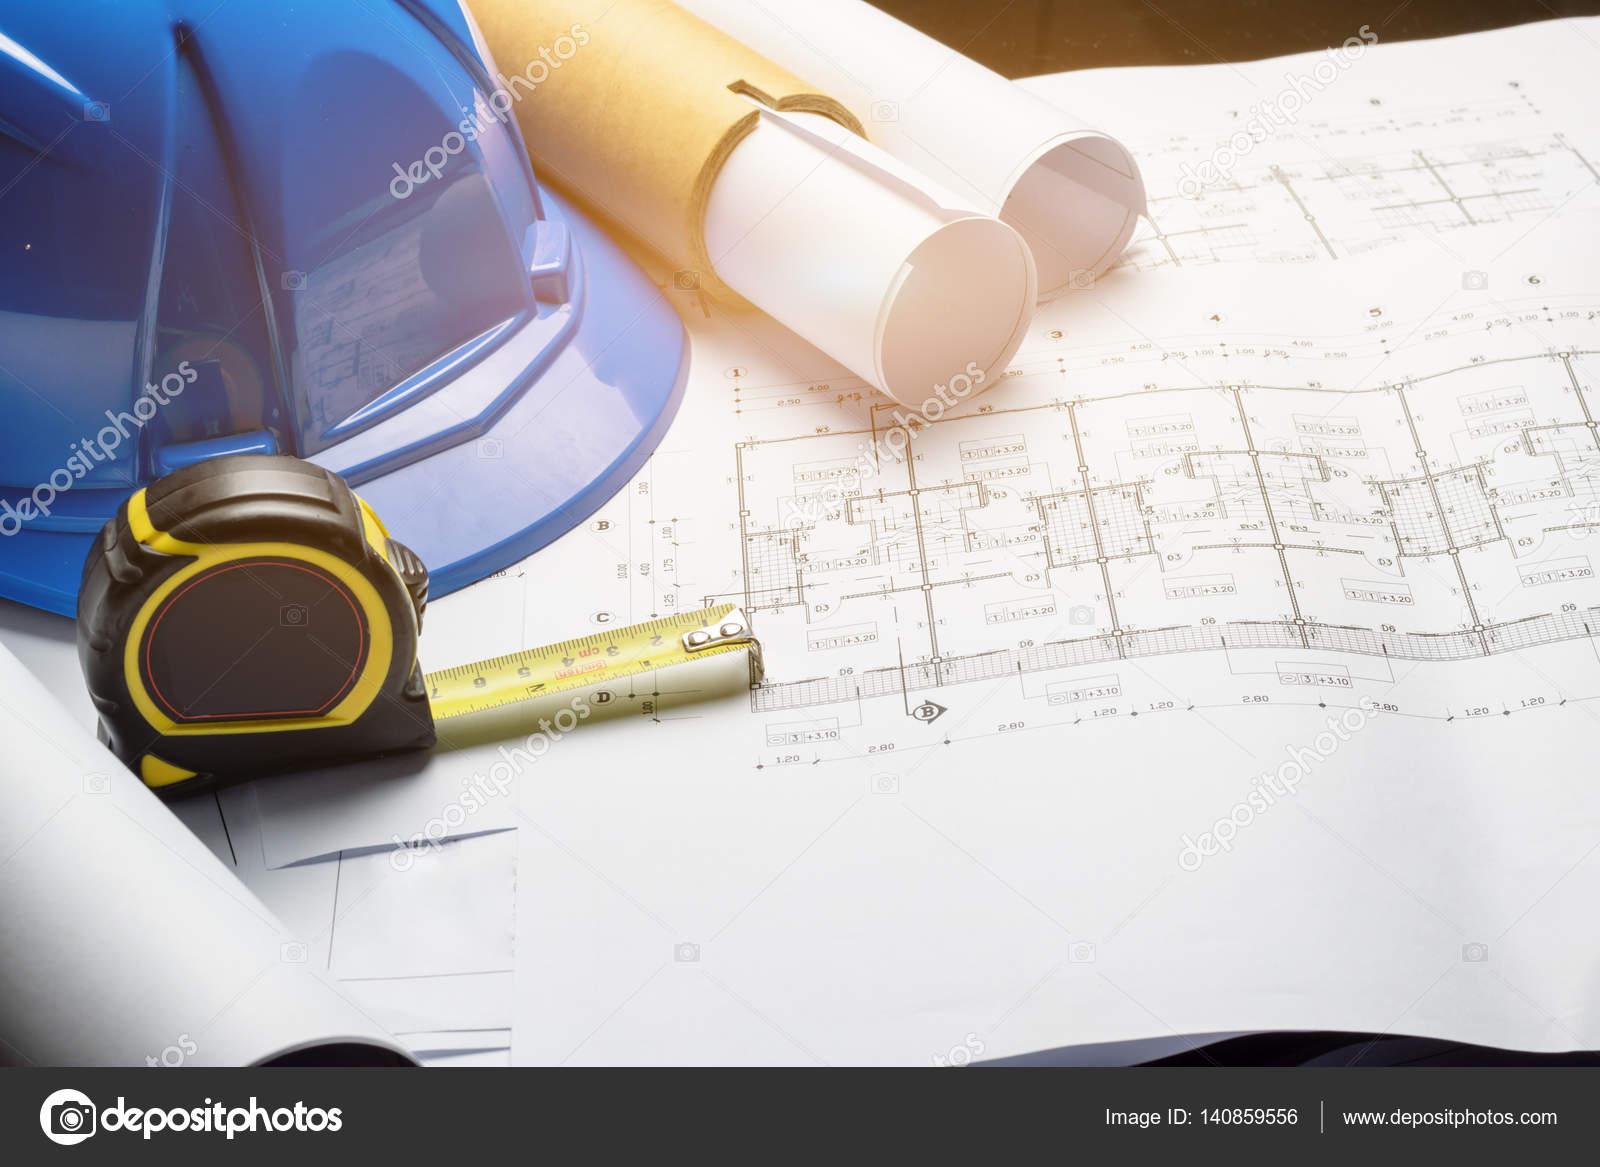 Engineering diagram blueprint paper drafting project sketch stock engineering diagram blueprint paper drafting project sketch stock photo malvernweather Choice Image